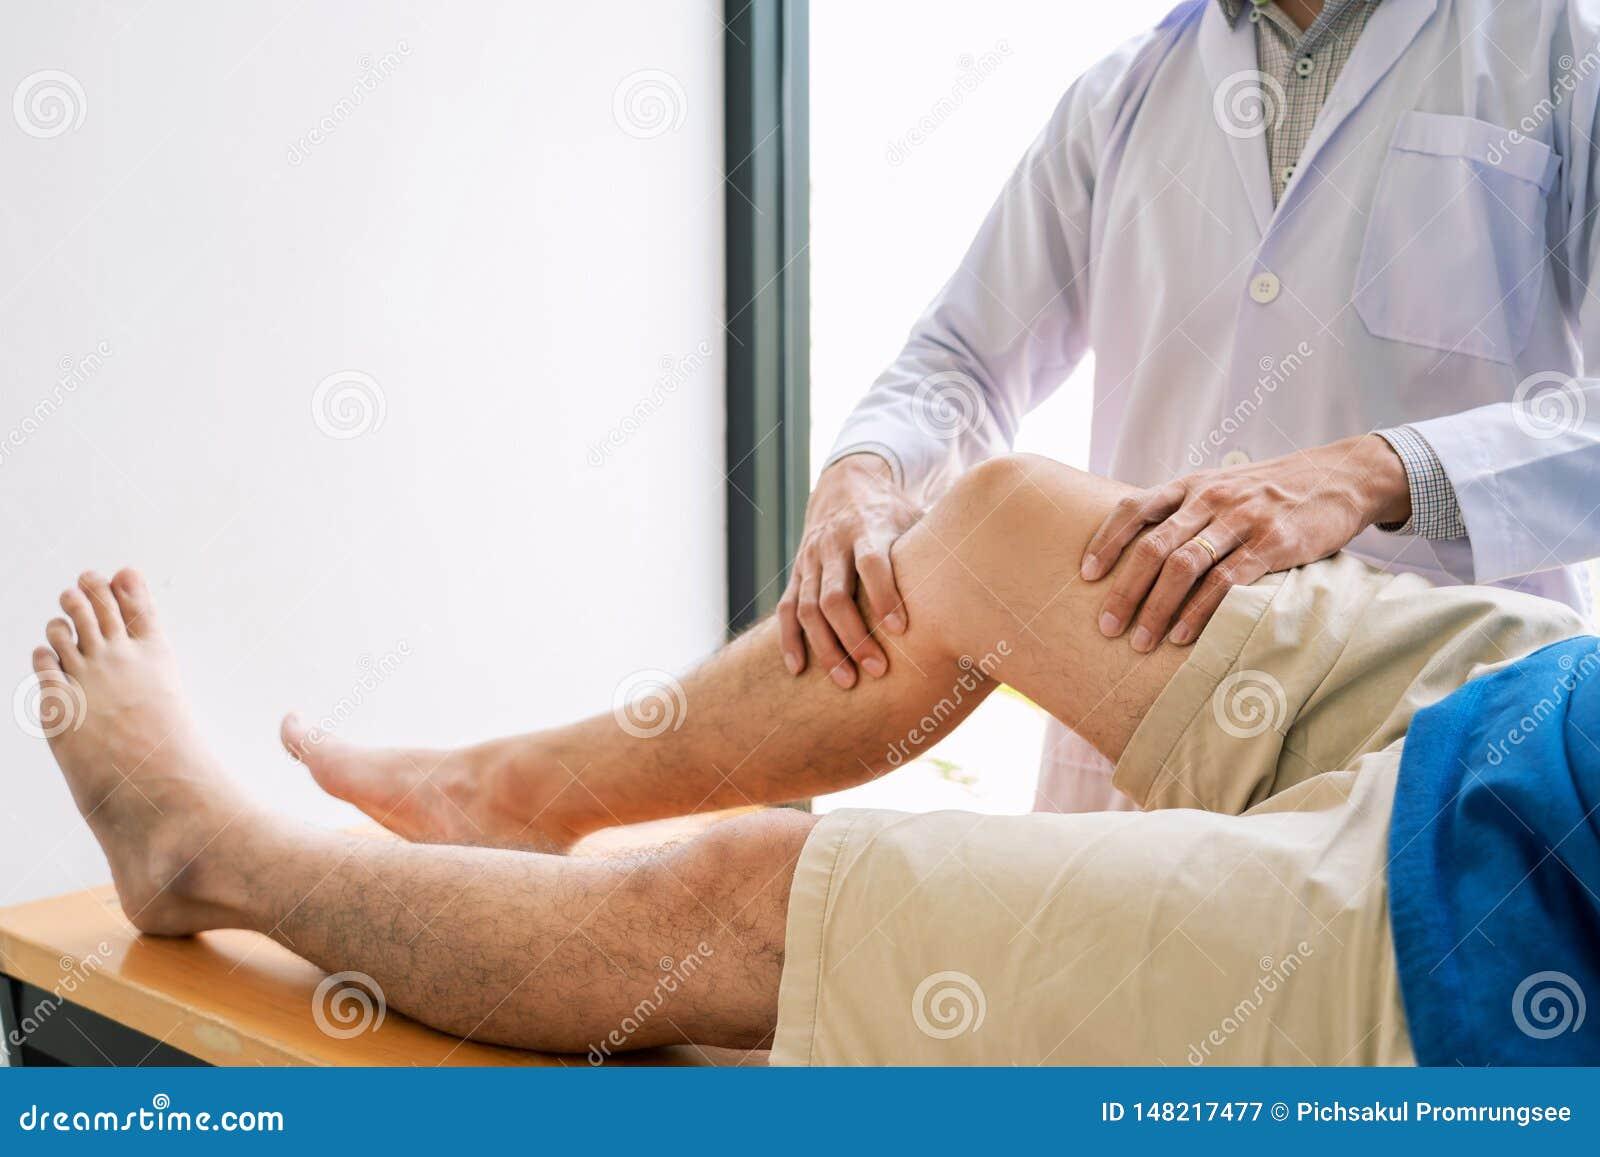 Fysiotherapeut artsenrehabilitatie het raadplegen fysiotherapie die uitoefenend beenbehandeling met pati?nt in fysiokliniek of ho